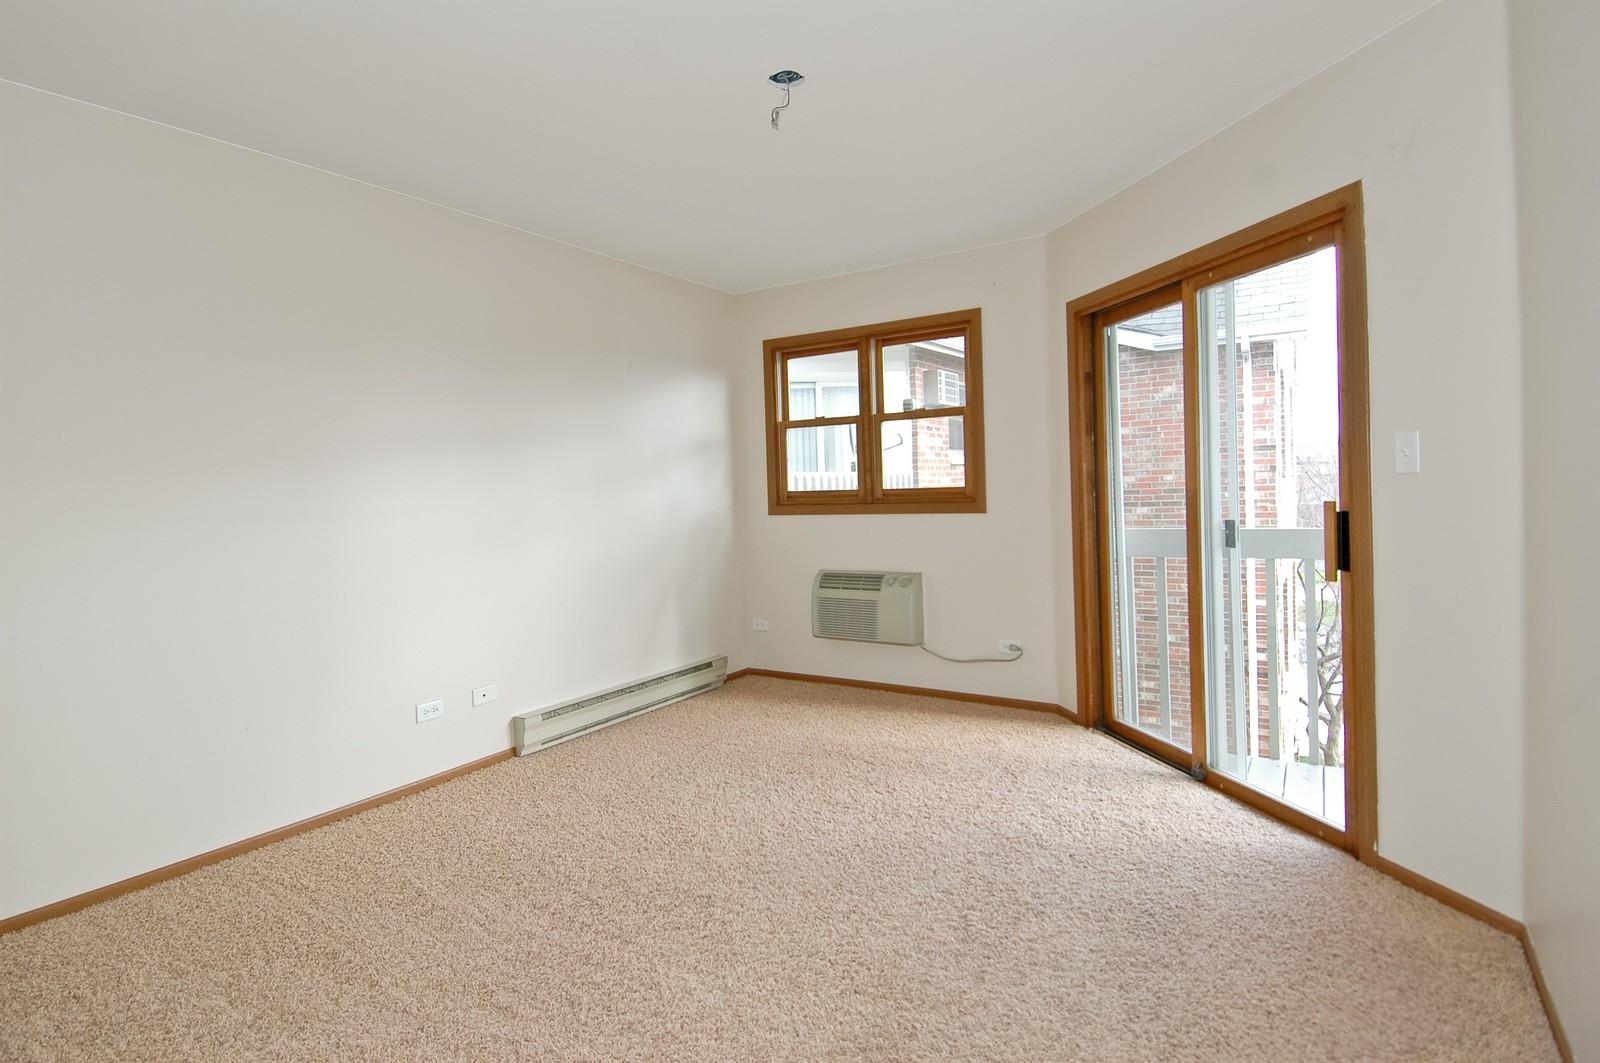 Real Estate Photography - 4314 Shamrock Ln, Unit 3B, McHenry, IL, 60050 - Bedroom